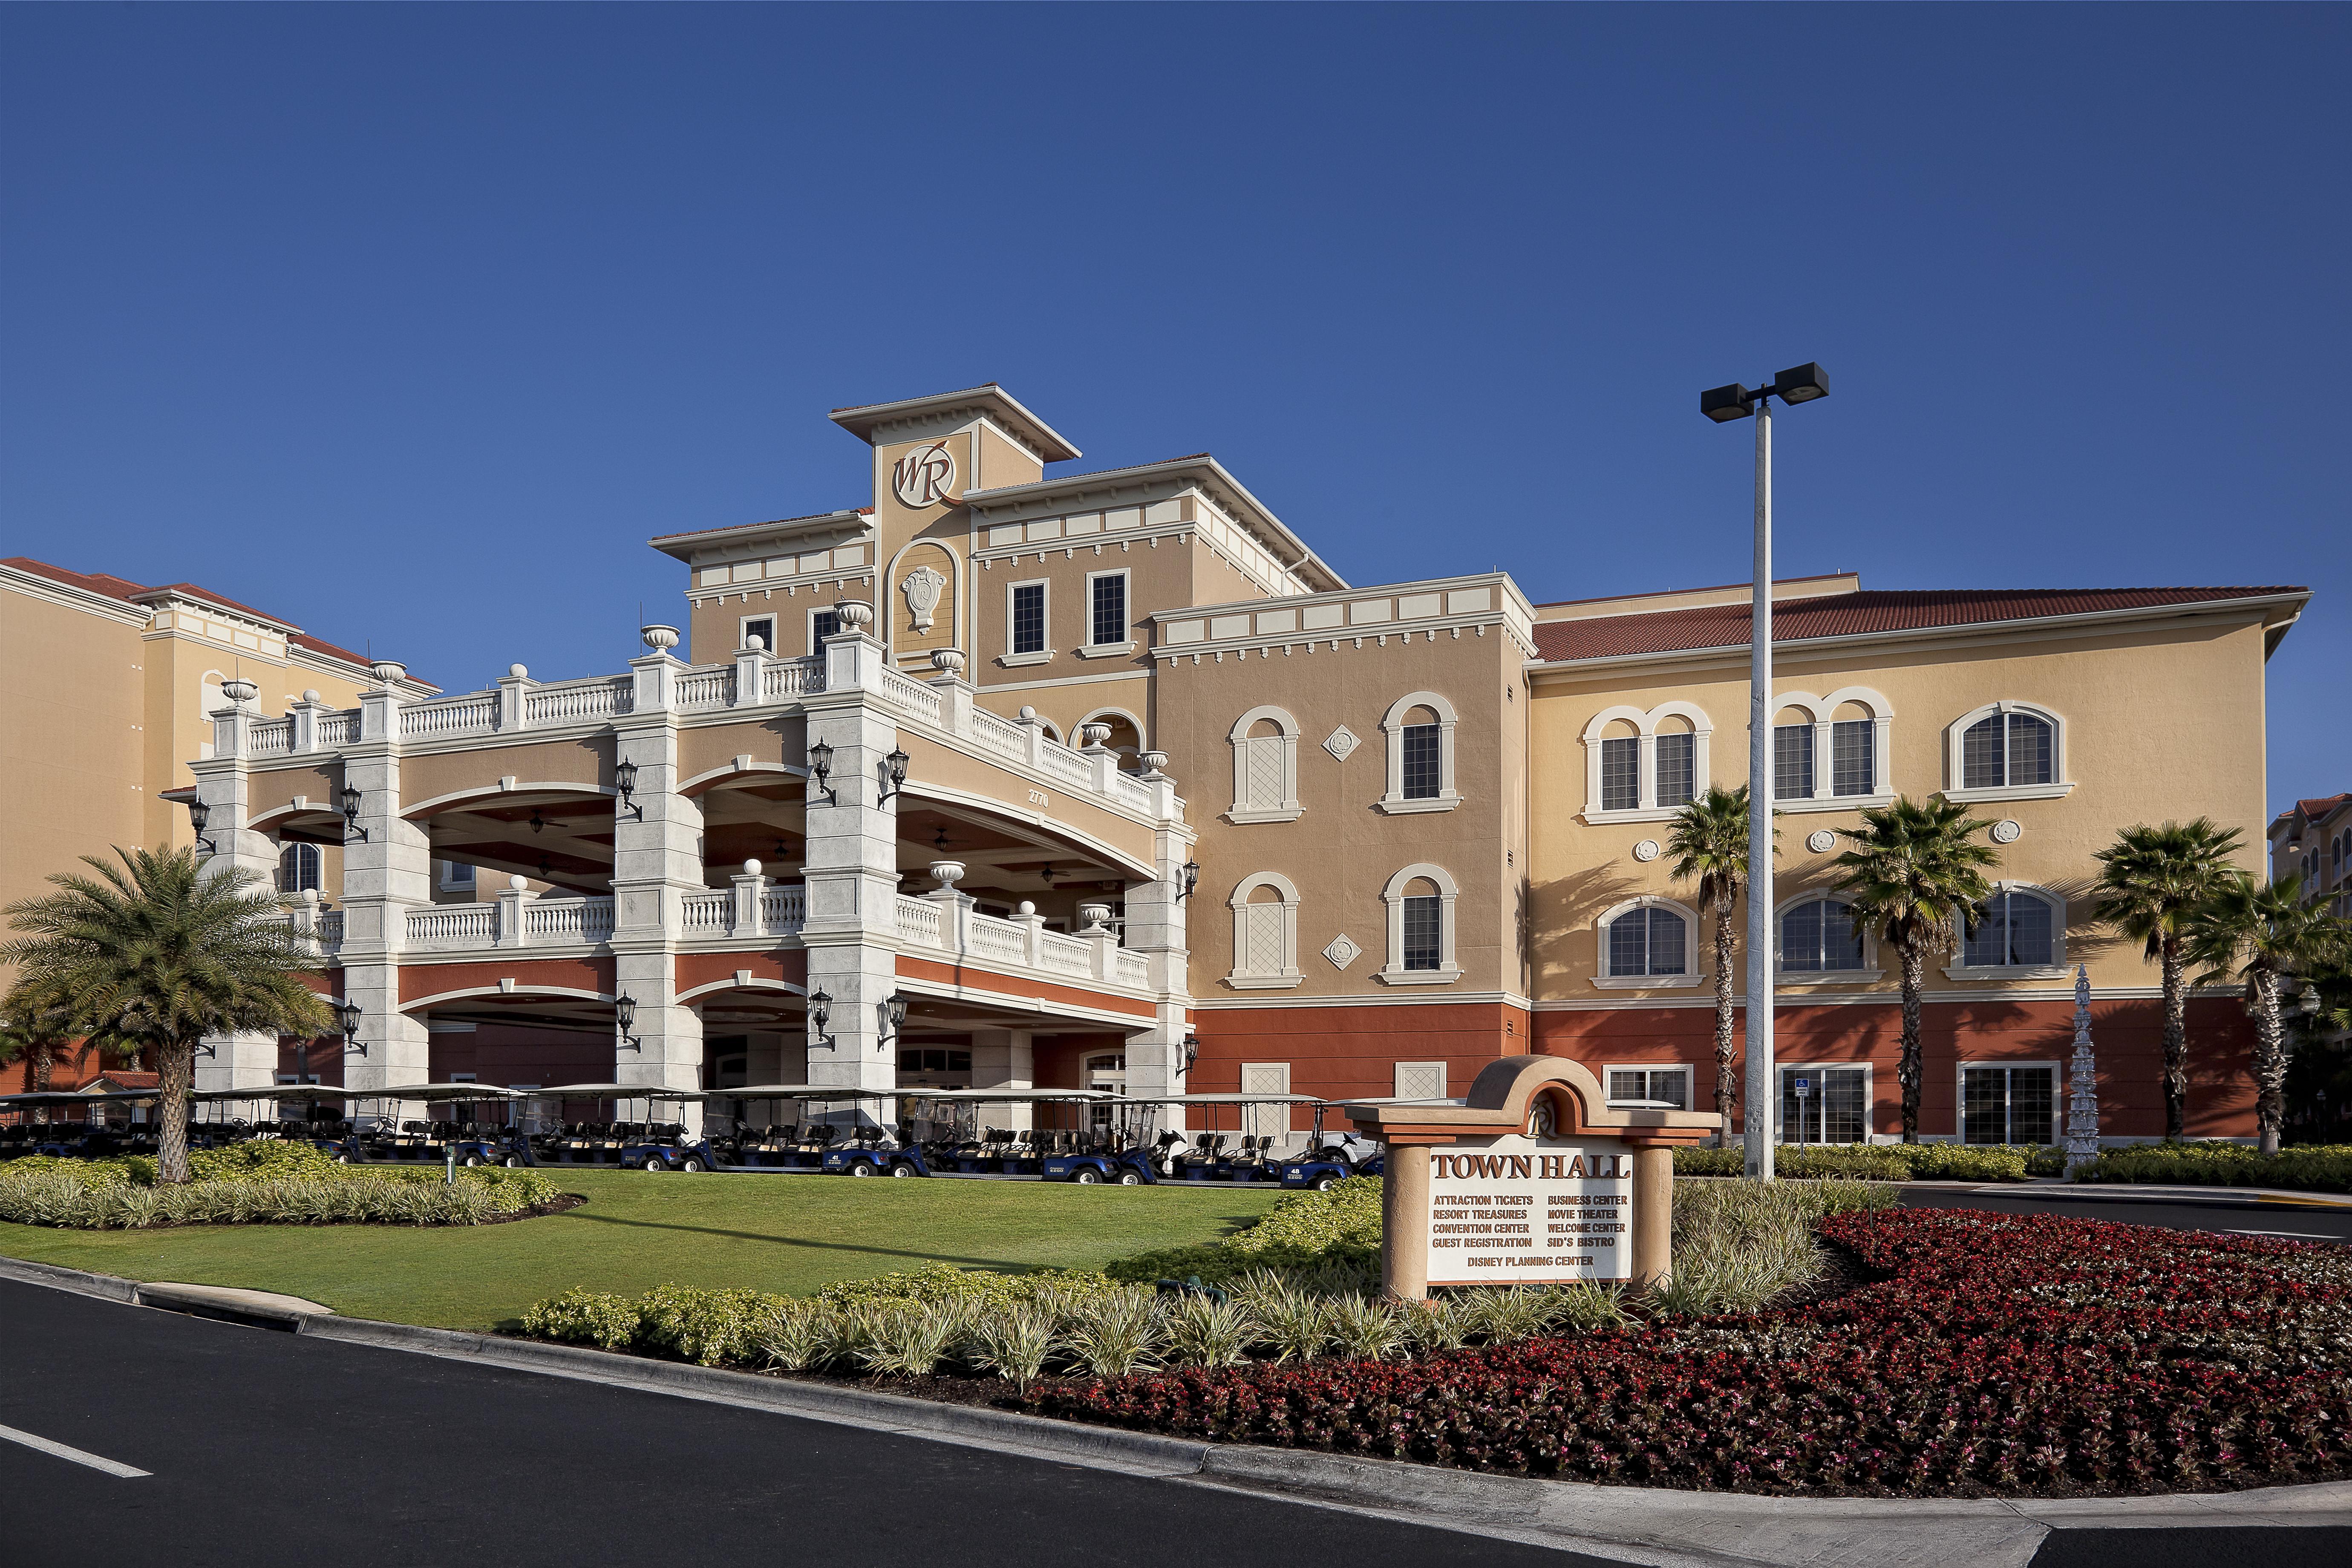 Kissimmee Hotel Deals - Exterior